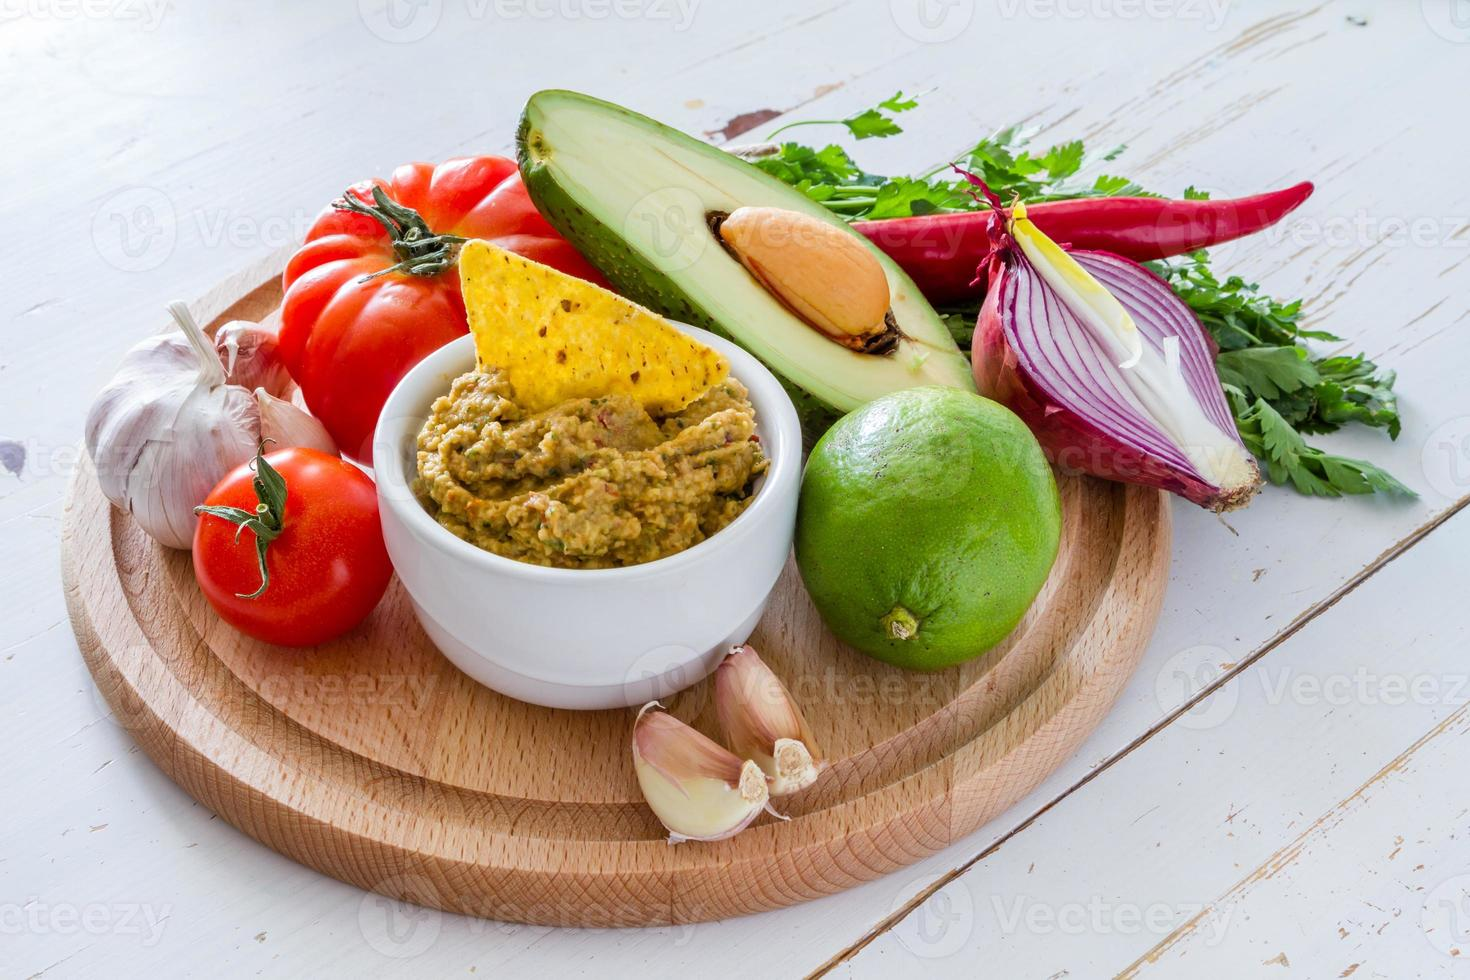 guacamole en ingrediënten - avocado, tomaten, ui, knoflook, limoen foto